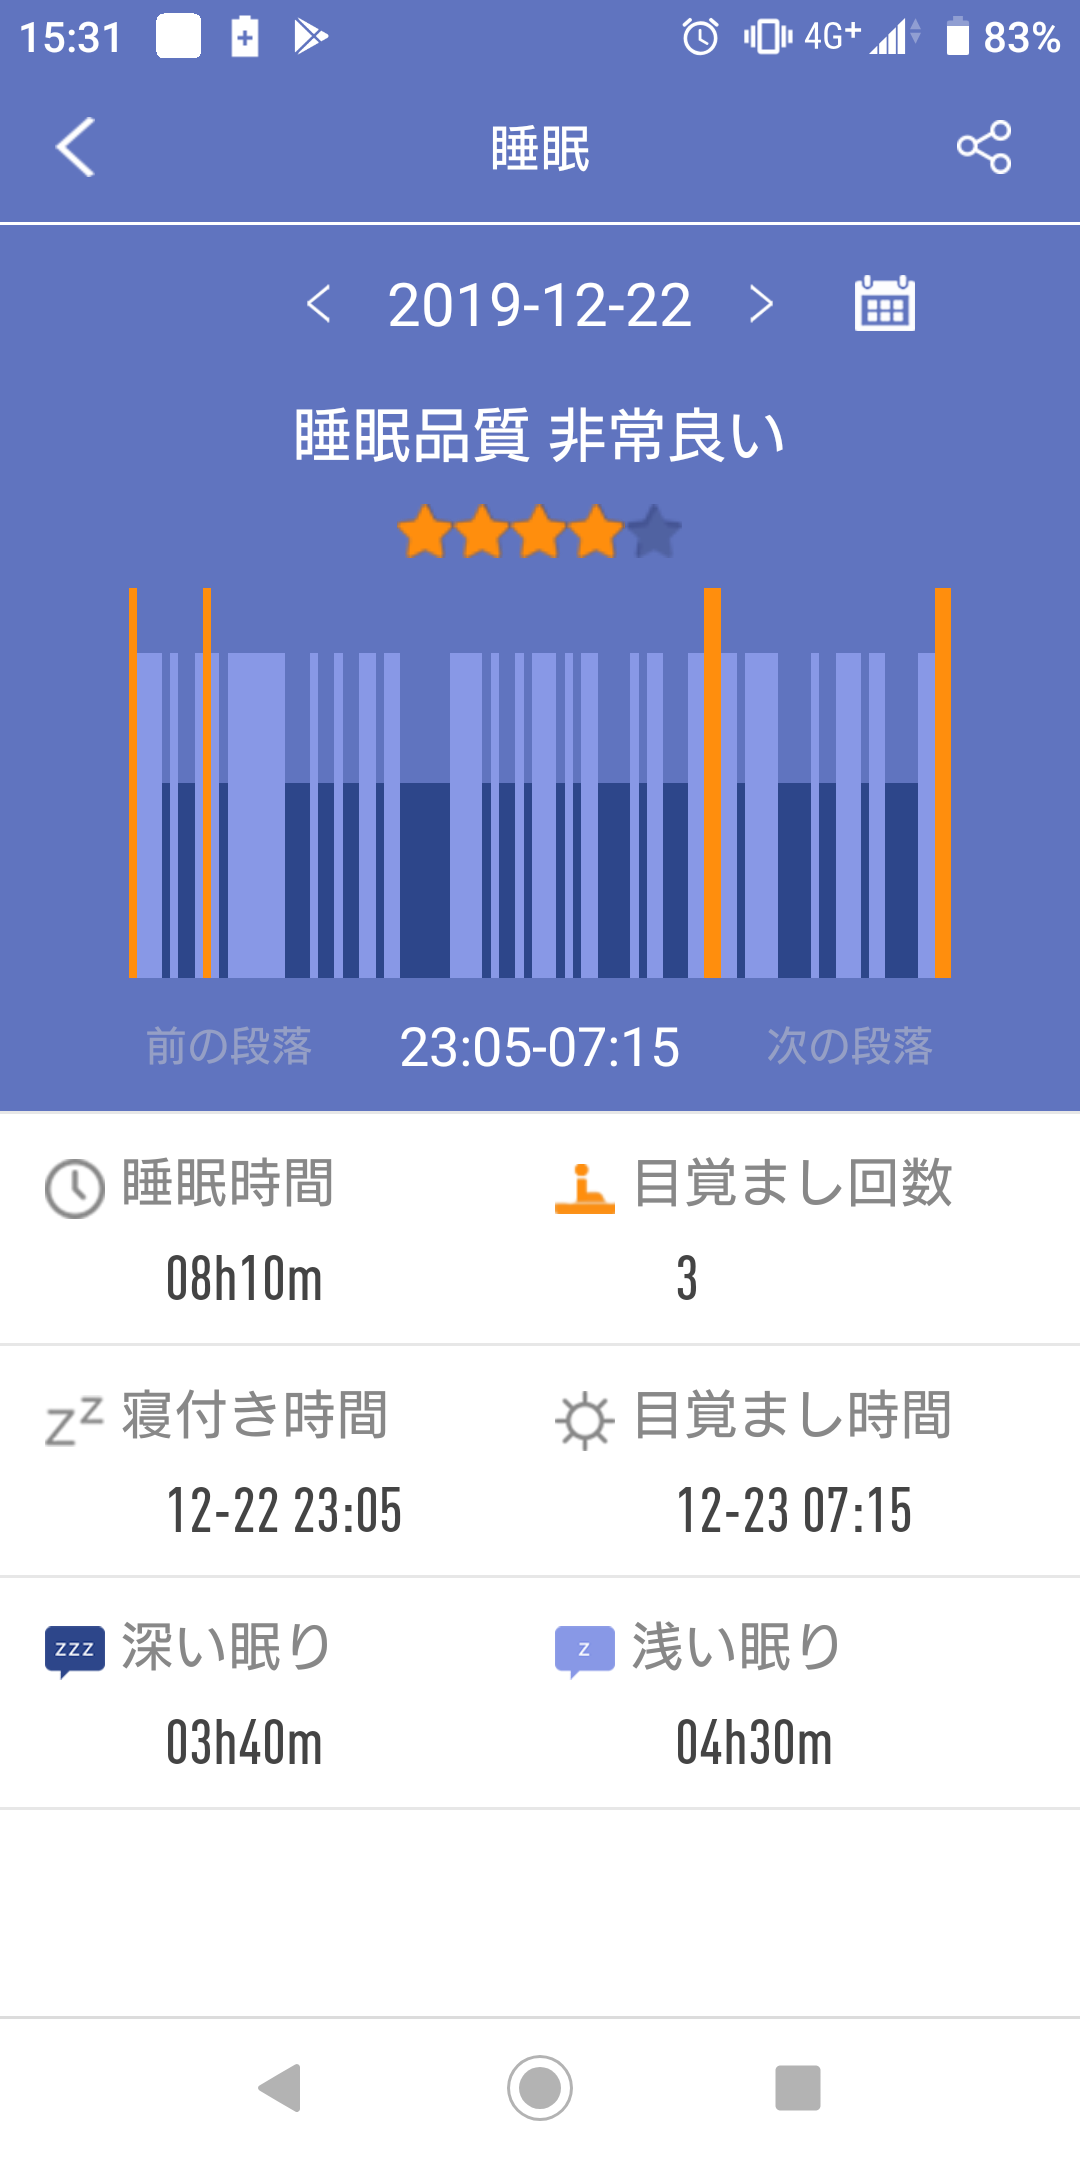 Screenshot_20191226-153131.png